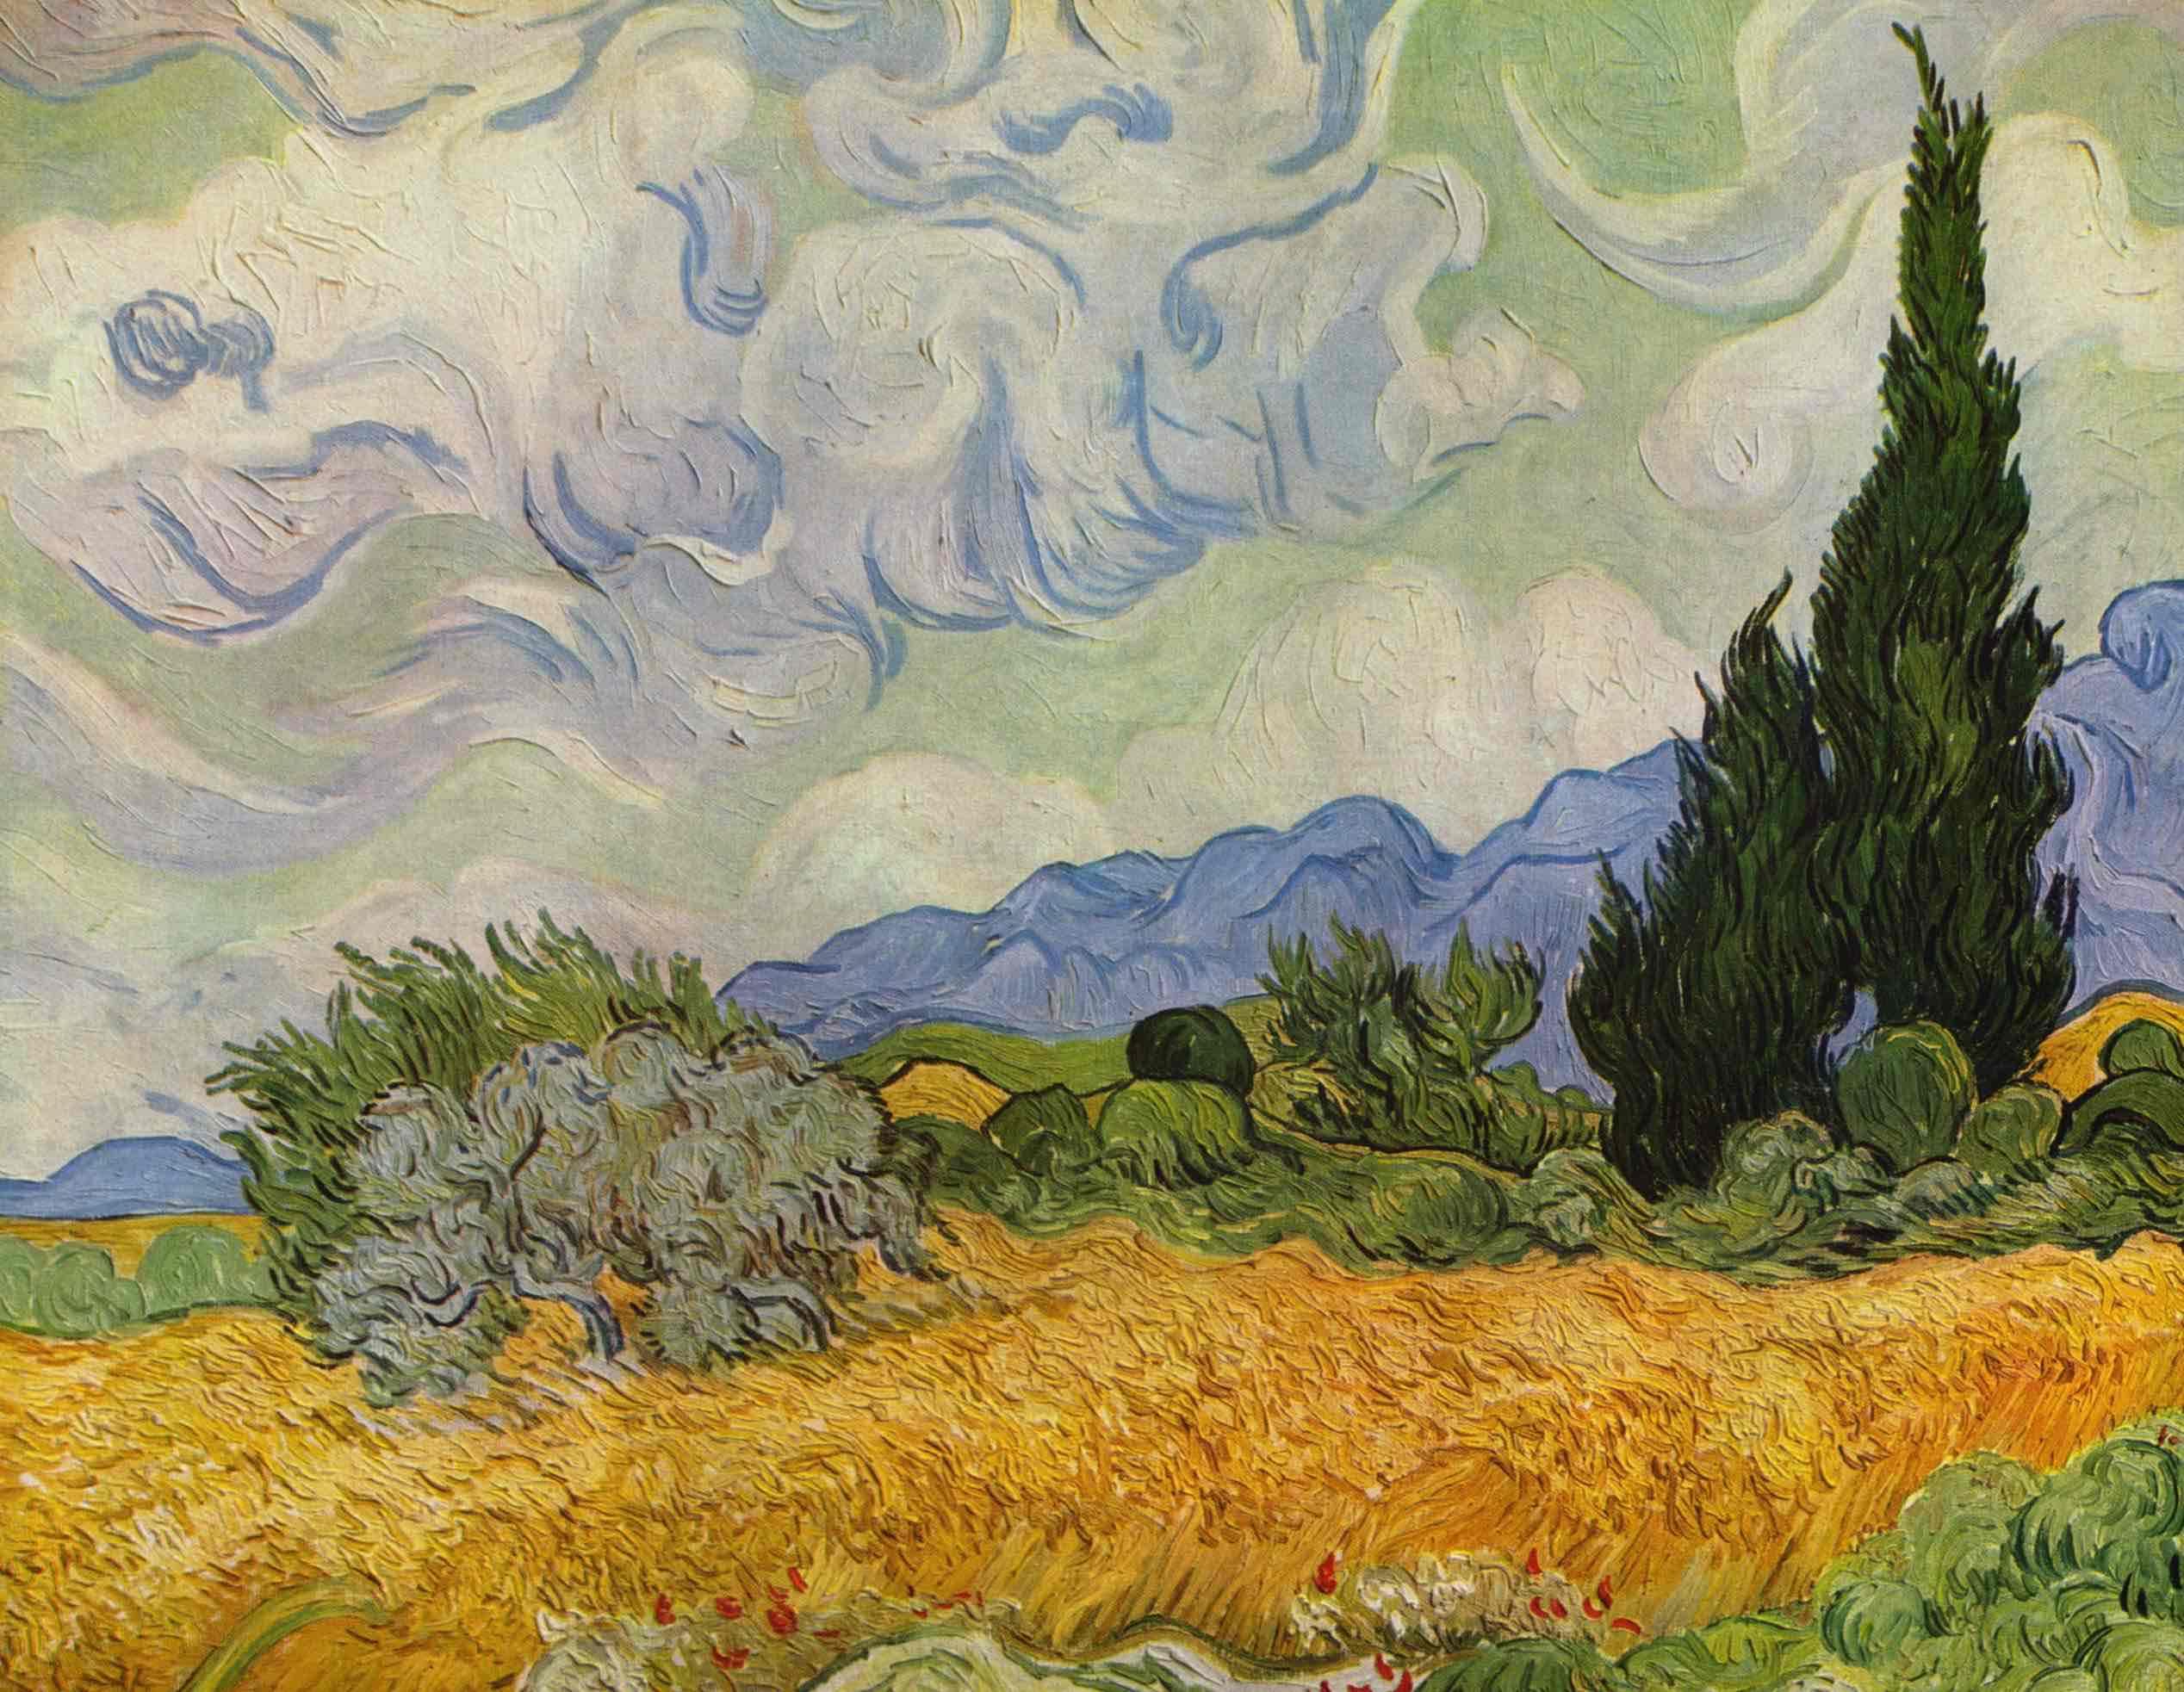 Cinque minuti di meditazione attraverso un'opera di Van Gogh